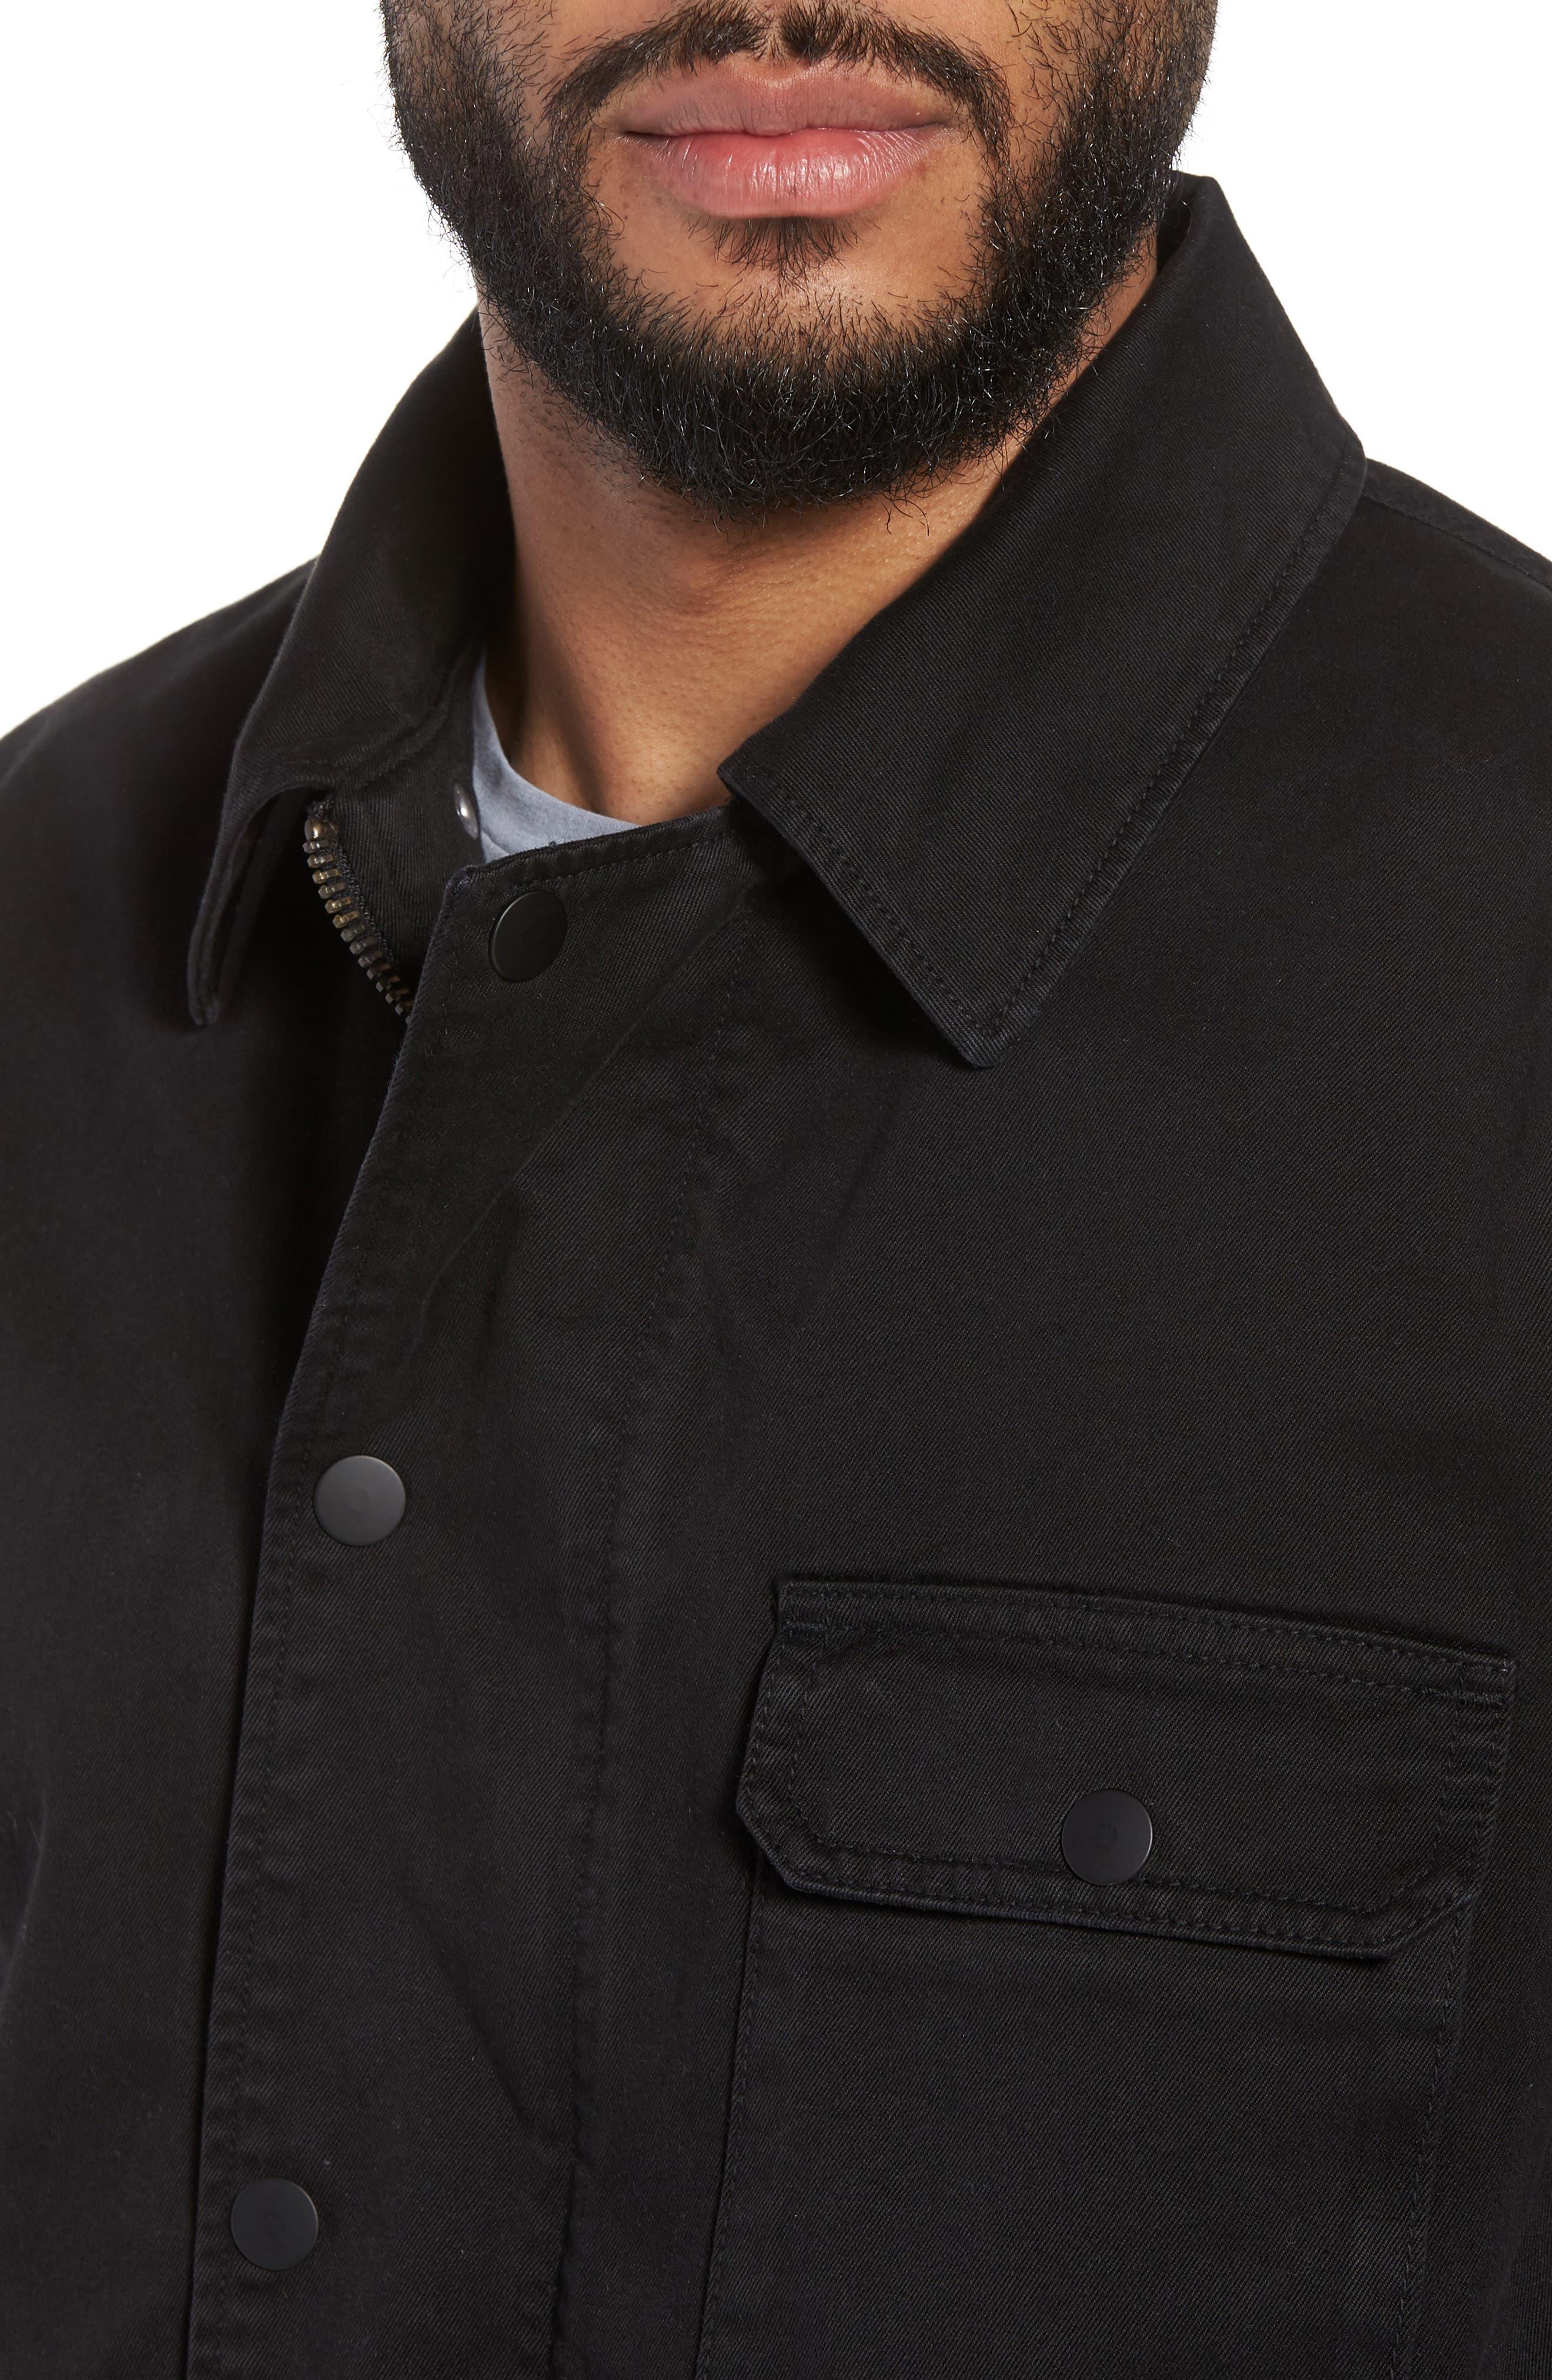 Hudson Military Jacket,                             Alternate thumbnail 4, color,                             001